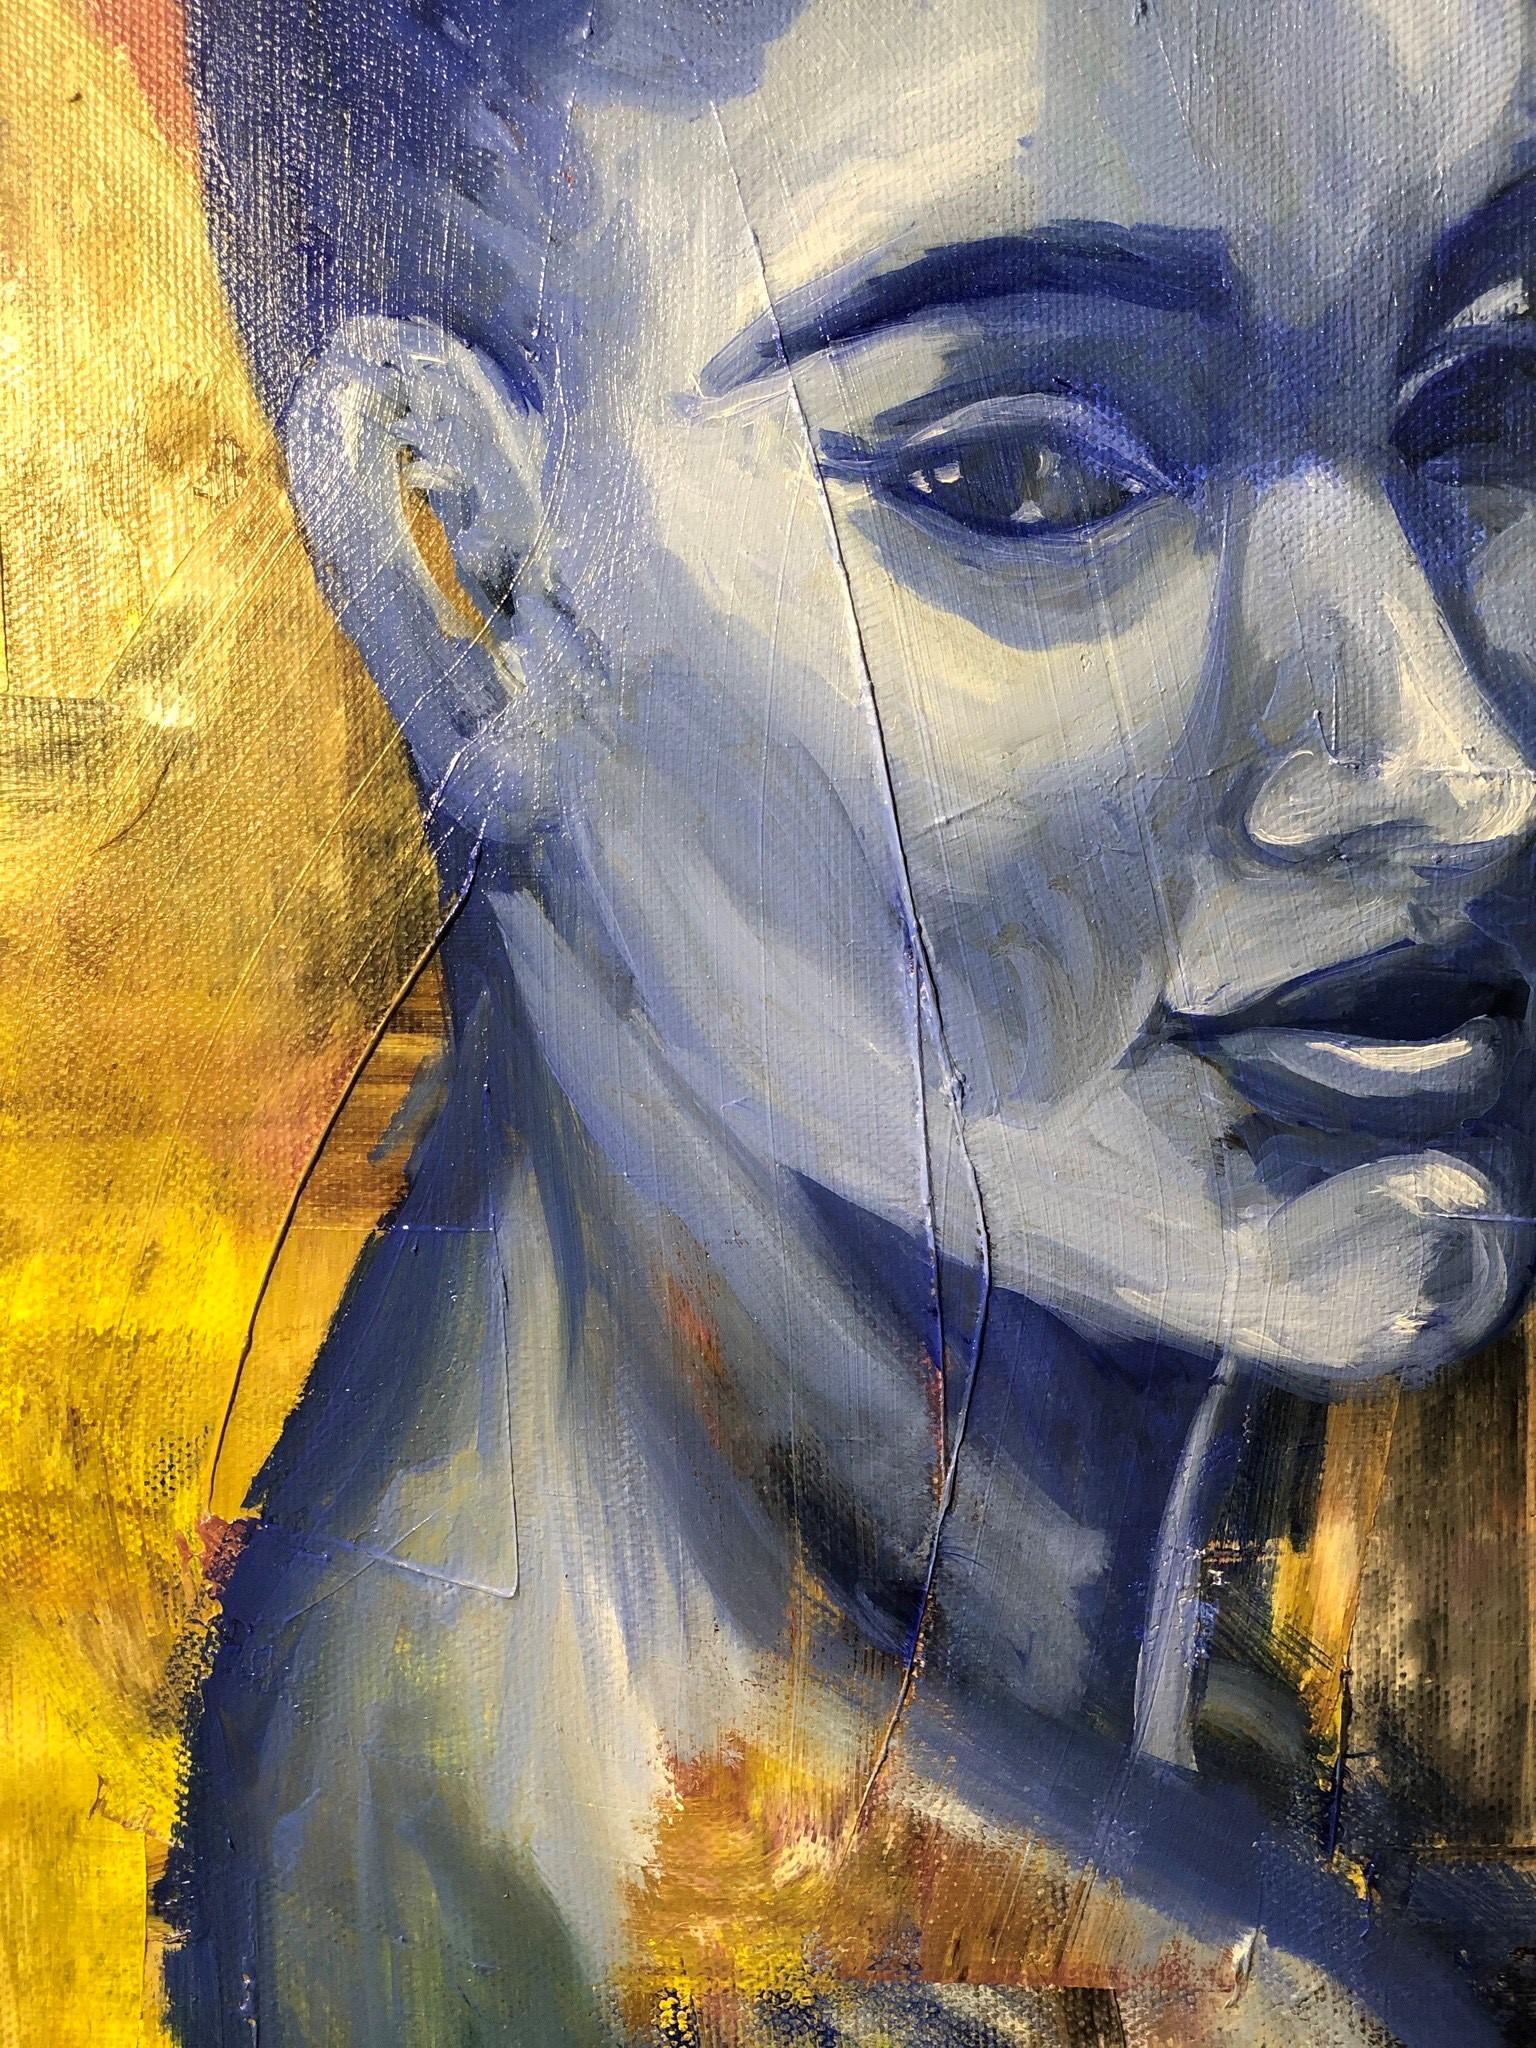 Work by Tronja Anglero (MG: February 2021)